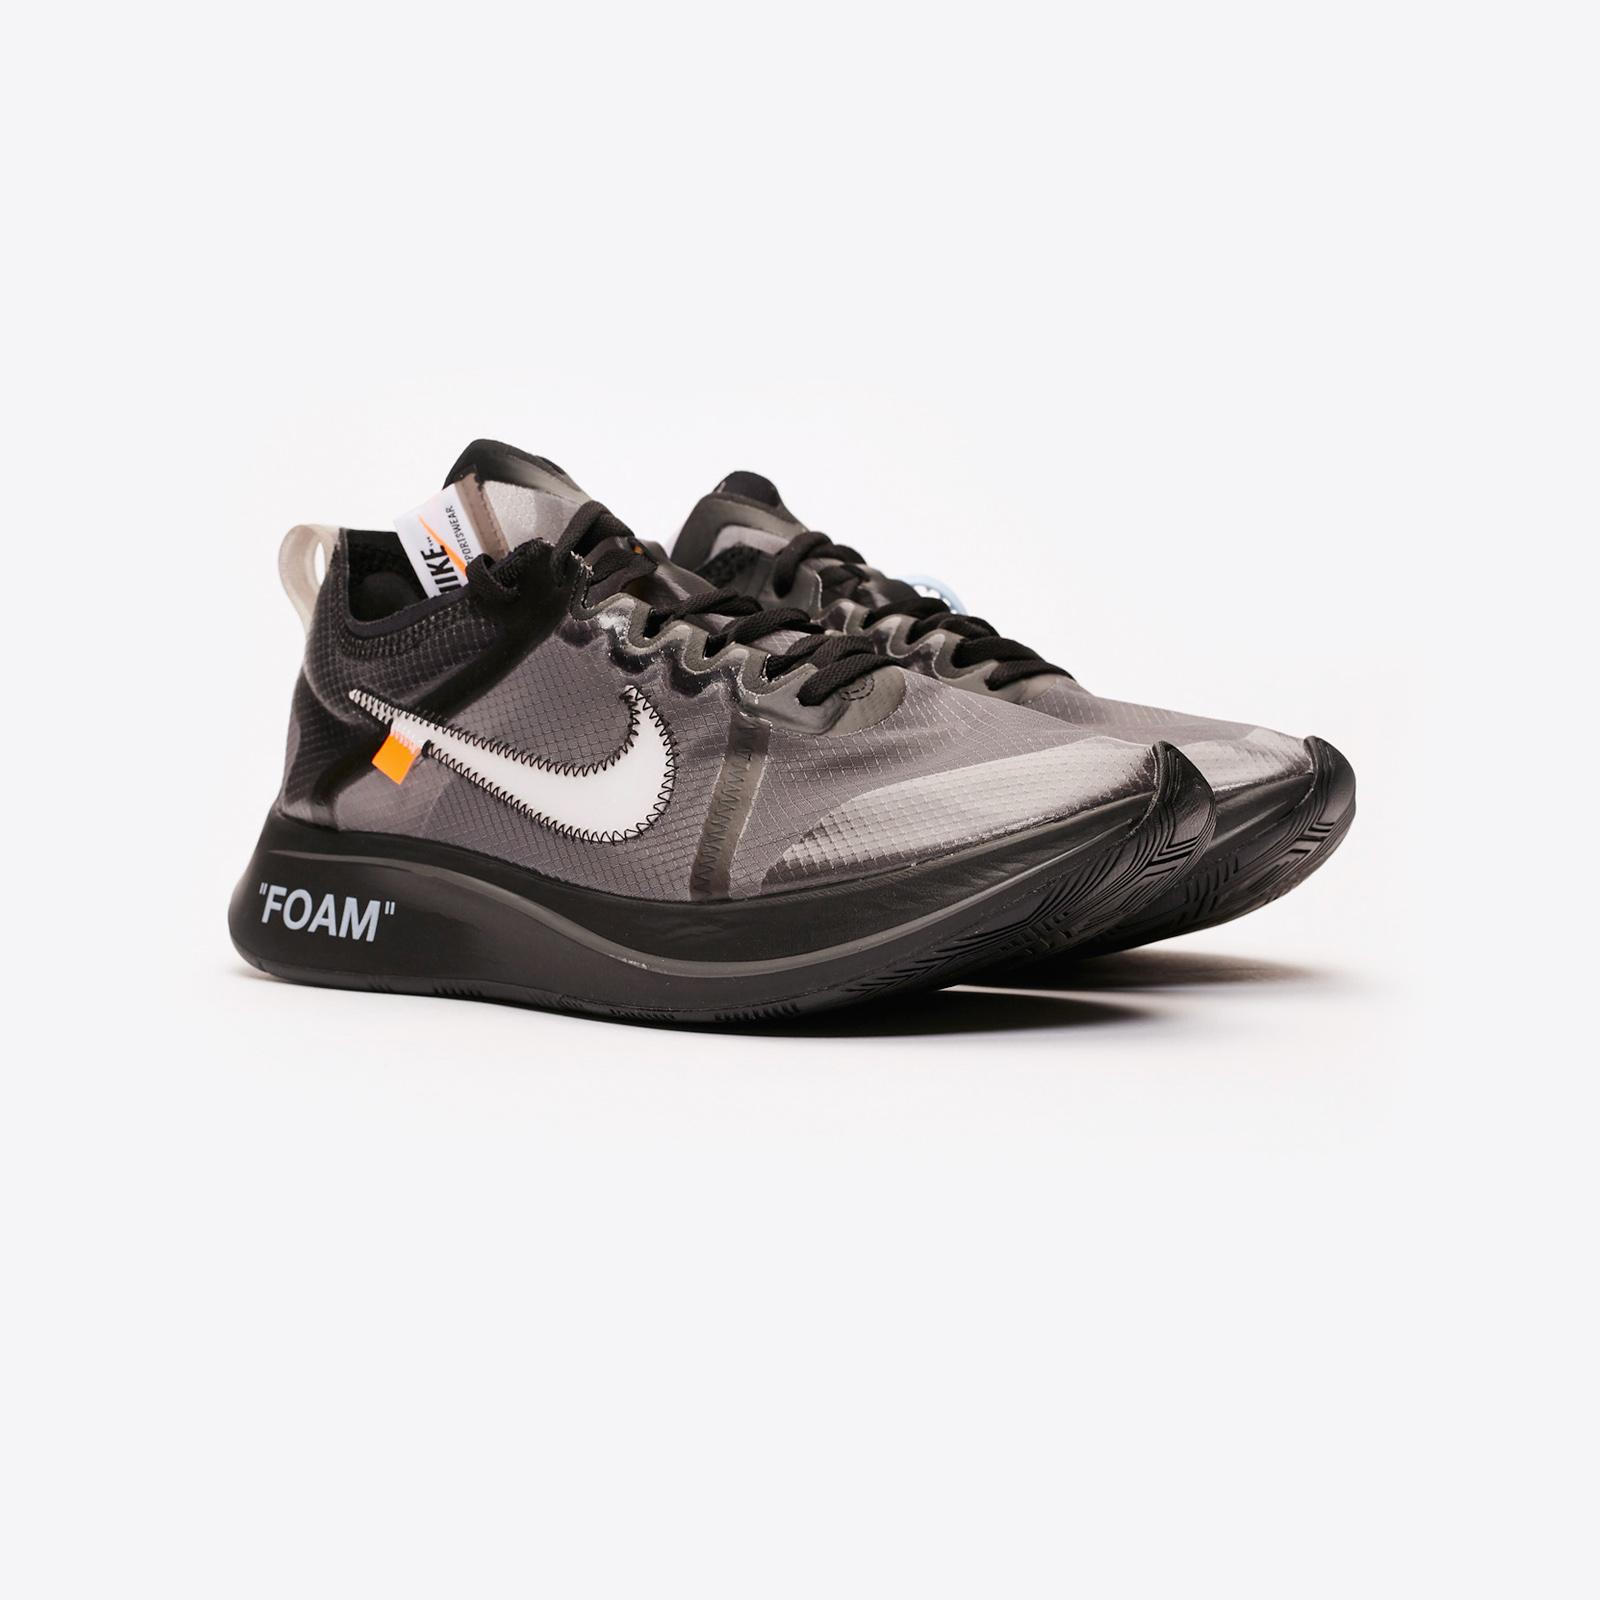 5cf6f08d6f0d1 Nike The 10  Zoom Fly - Aj4588-001 - Sneakersnstuff